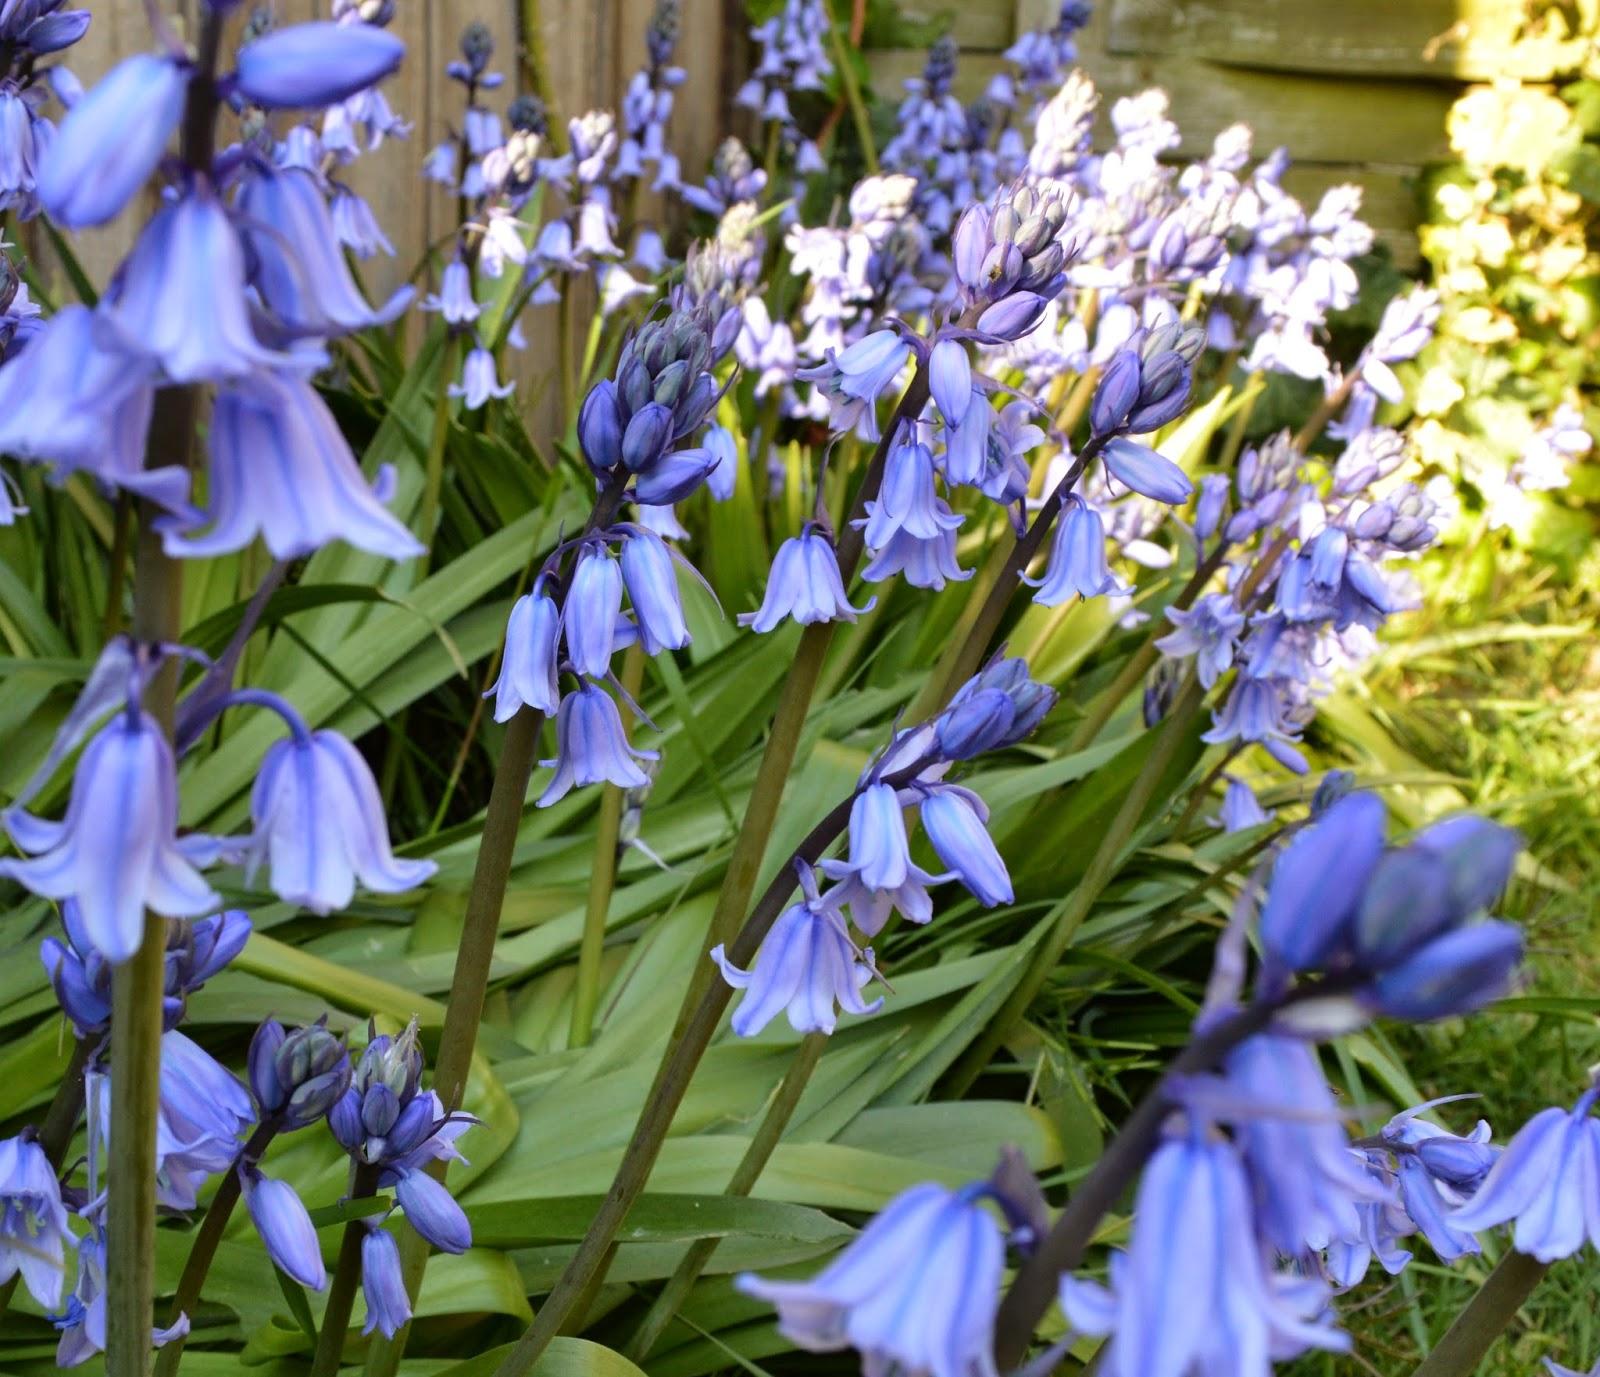 Bluebell, flowers, garden, bloom, blue, lots of, multiple, English, Springtime, Spring, sunshine, photograph, photo